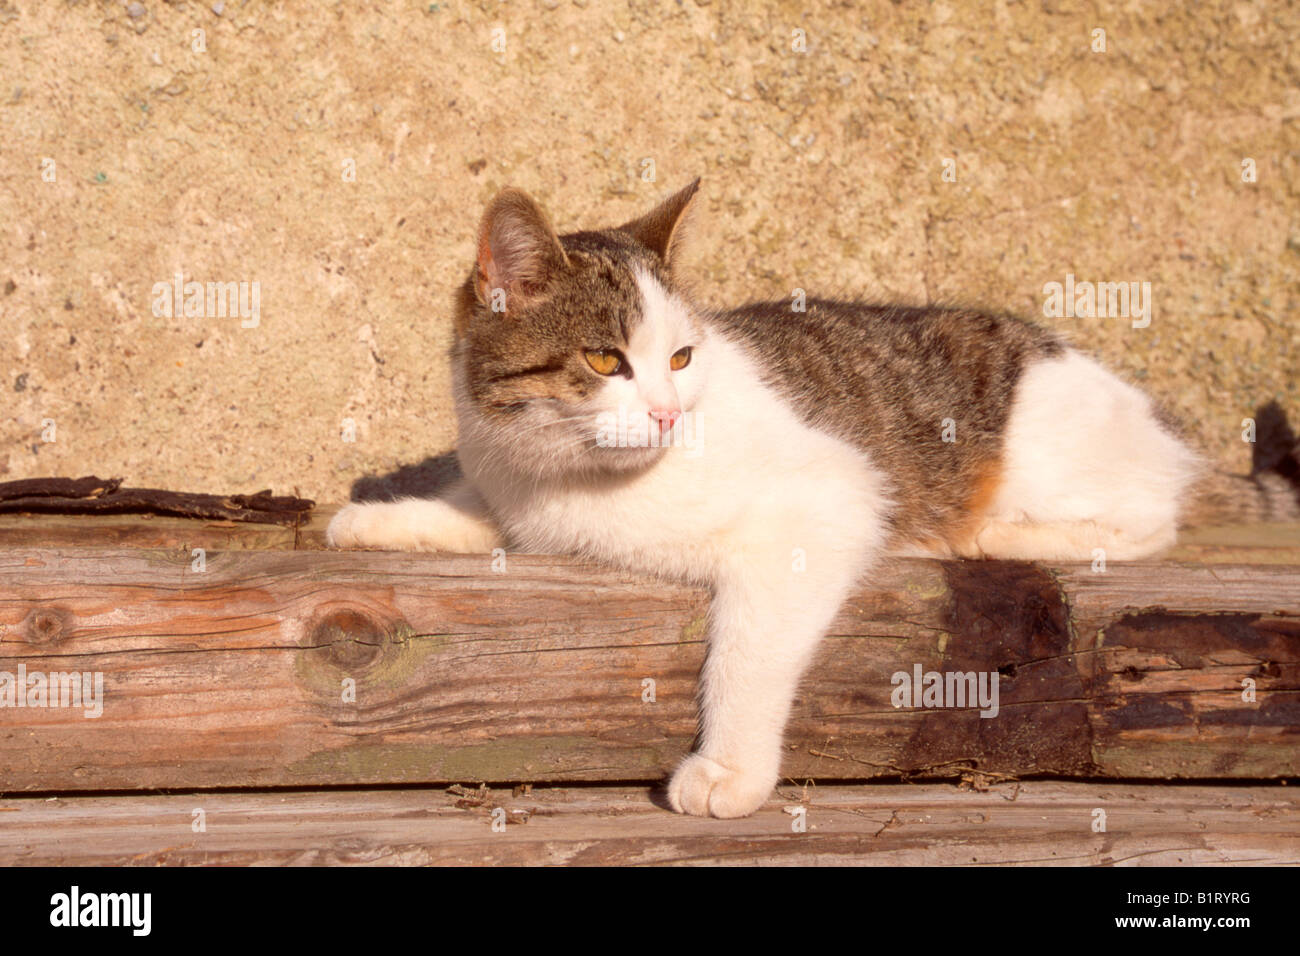 Domestic Cat (Felis silvestris f. catus) Stock Photo